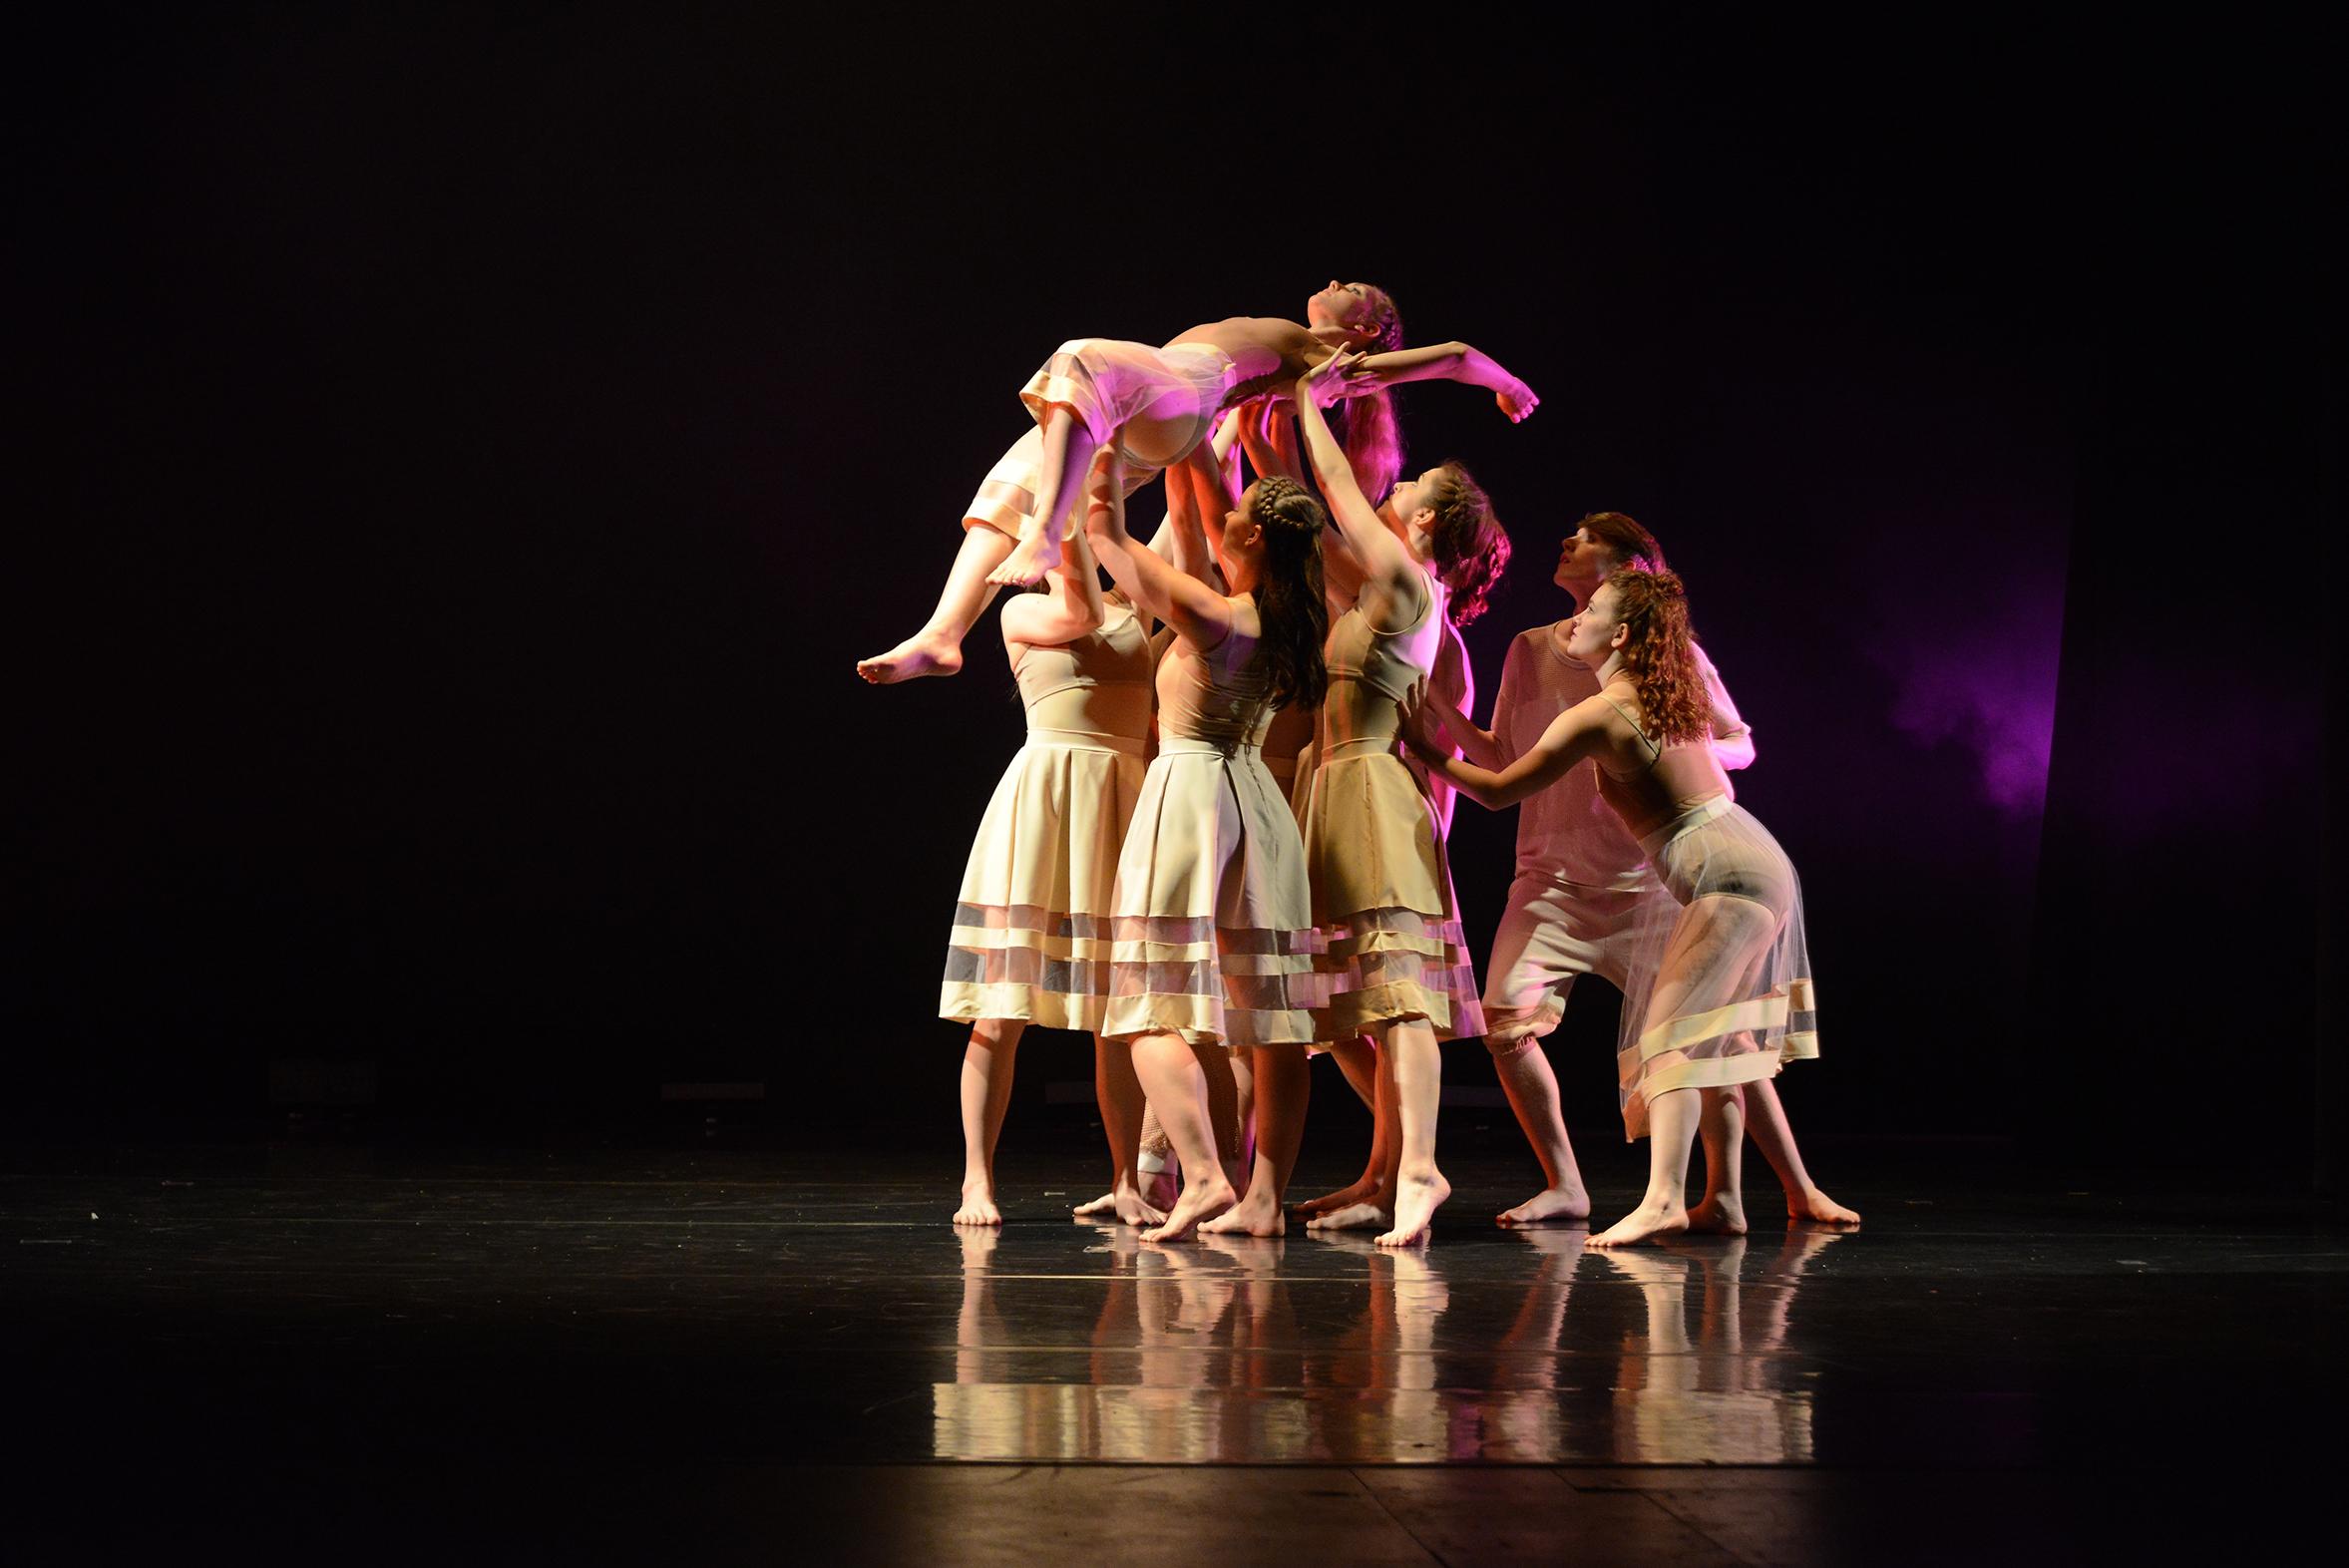 Dancing Toward Change